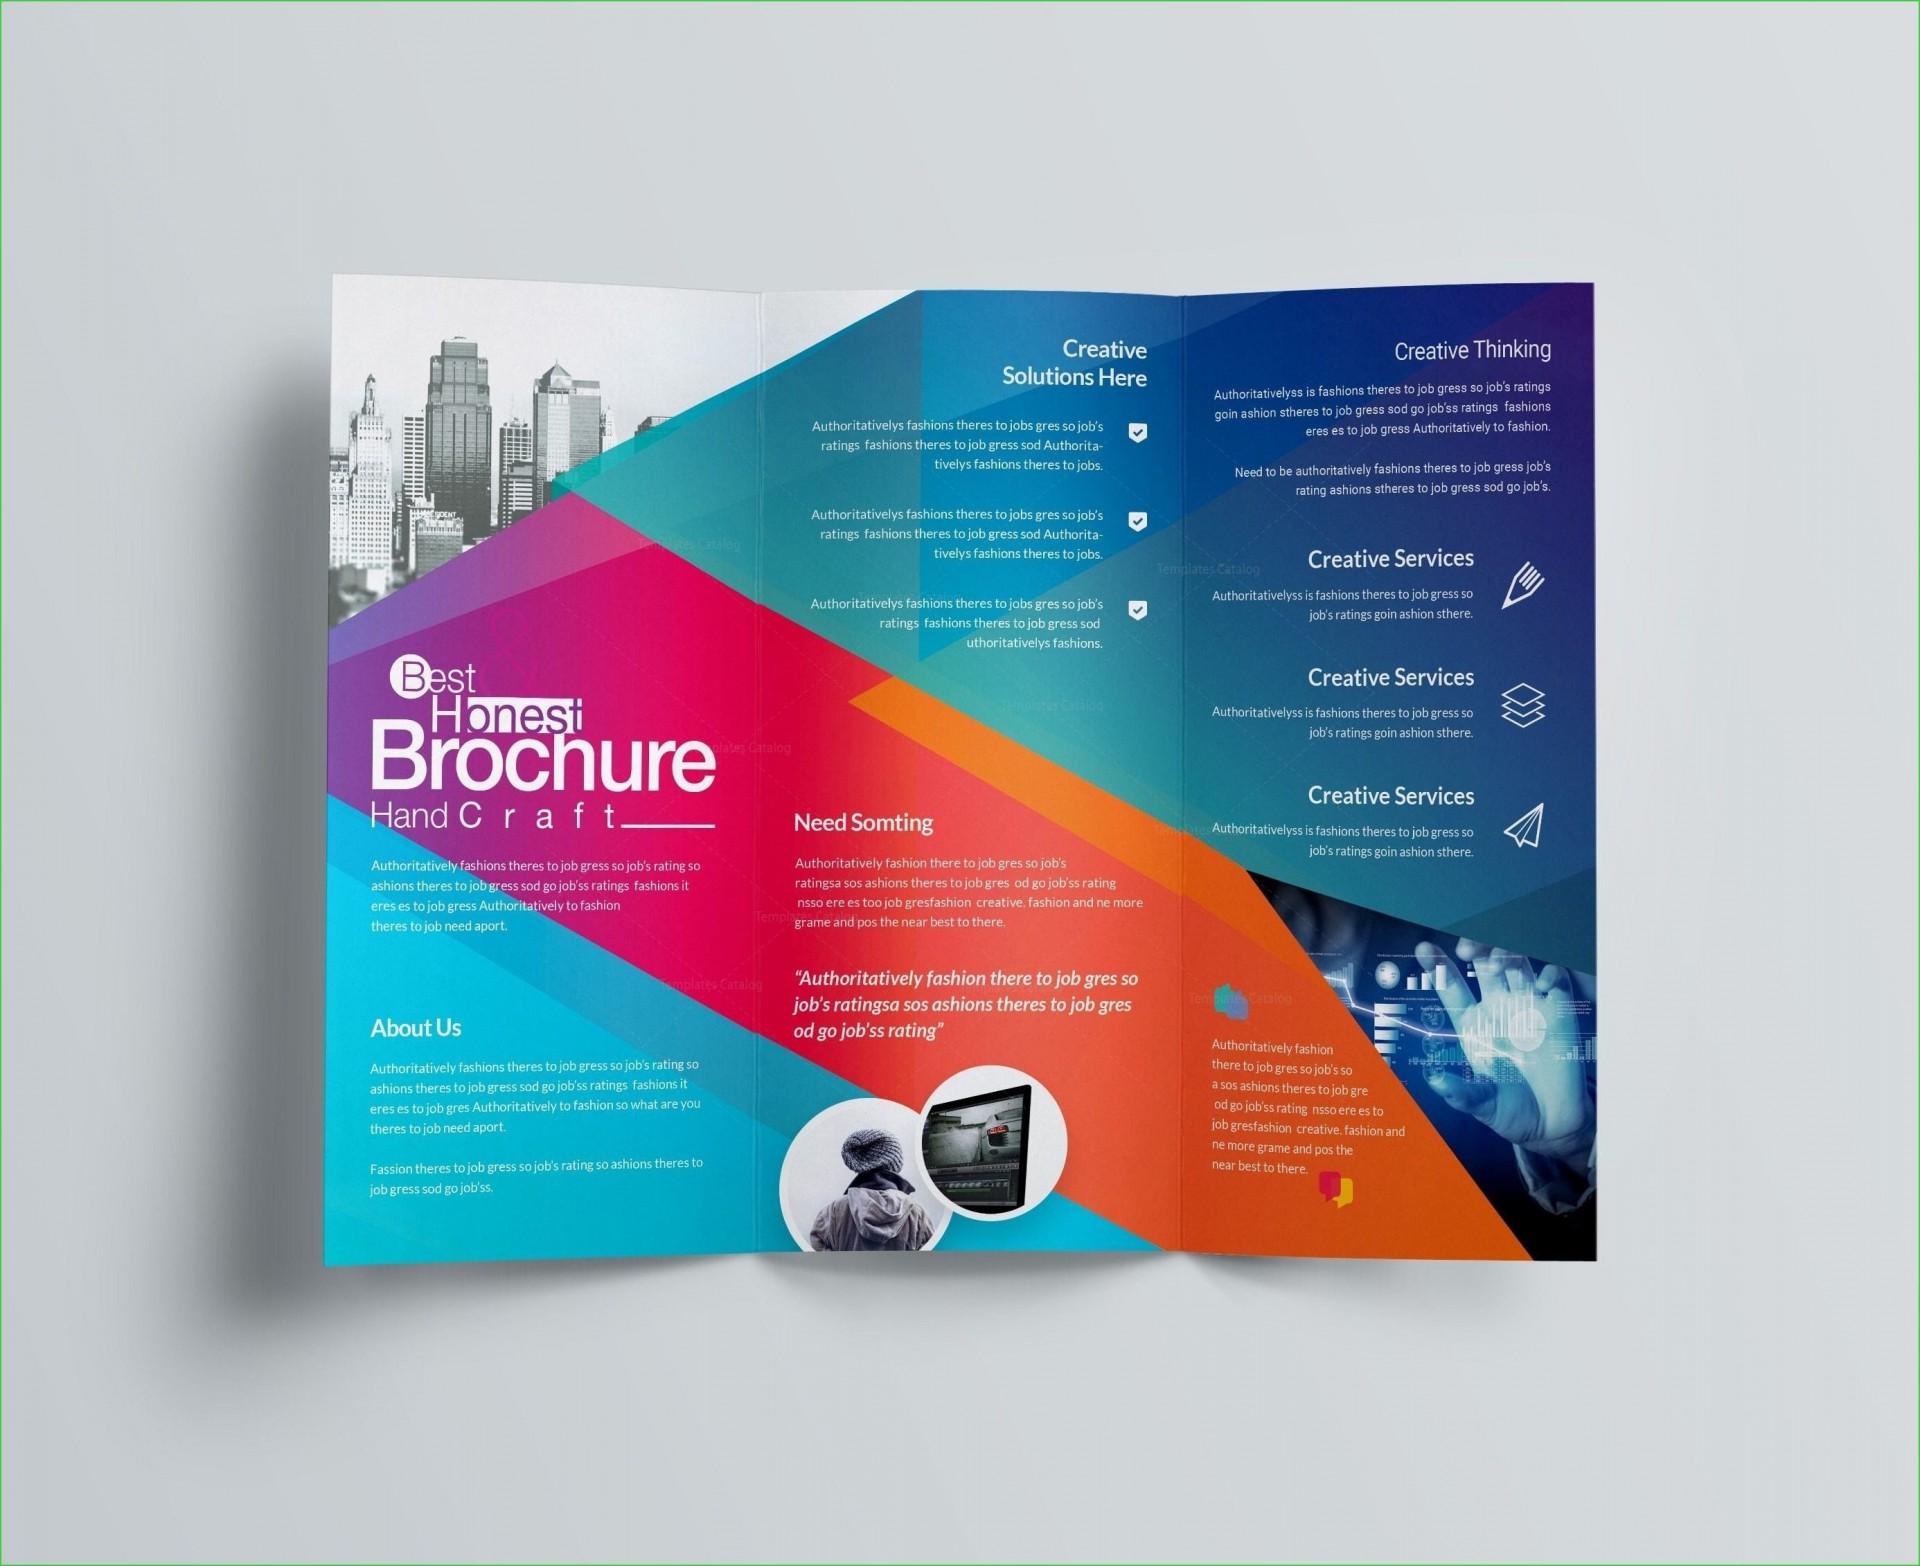 004 Sensational Bi Fold Brochure Template Word Image  Free Download Microsoft1920